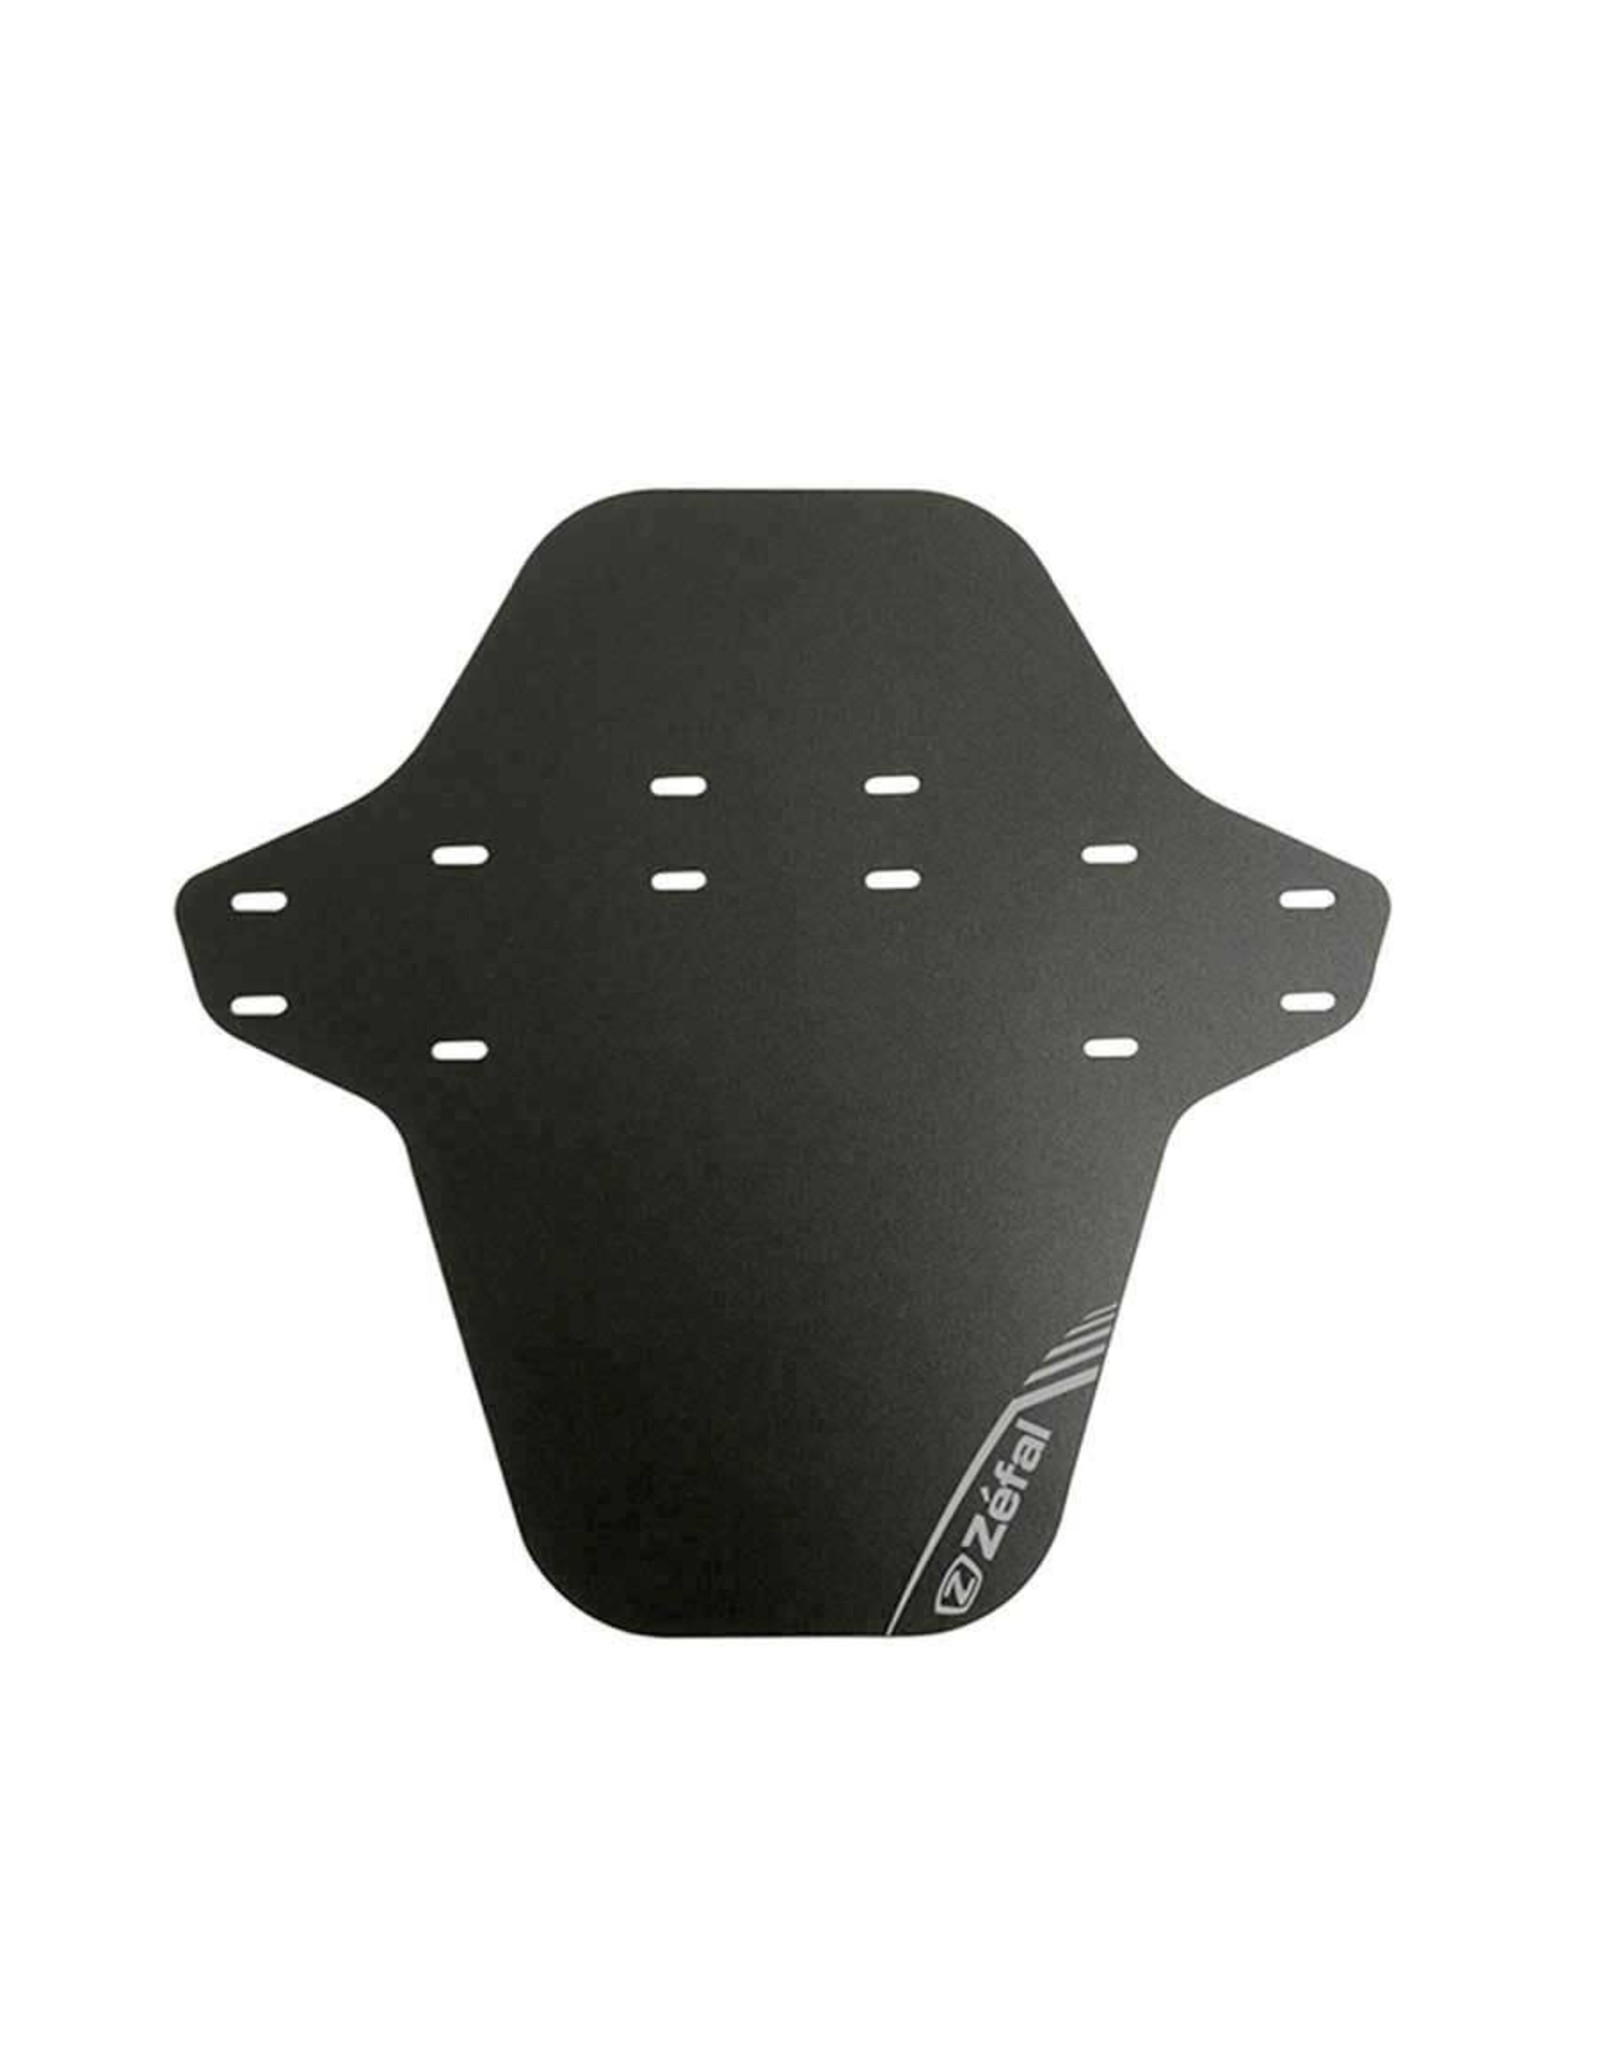 Zefal Zefal Deflector Lite XL Flexible mudguard S19